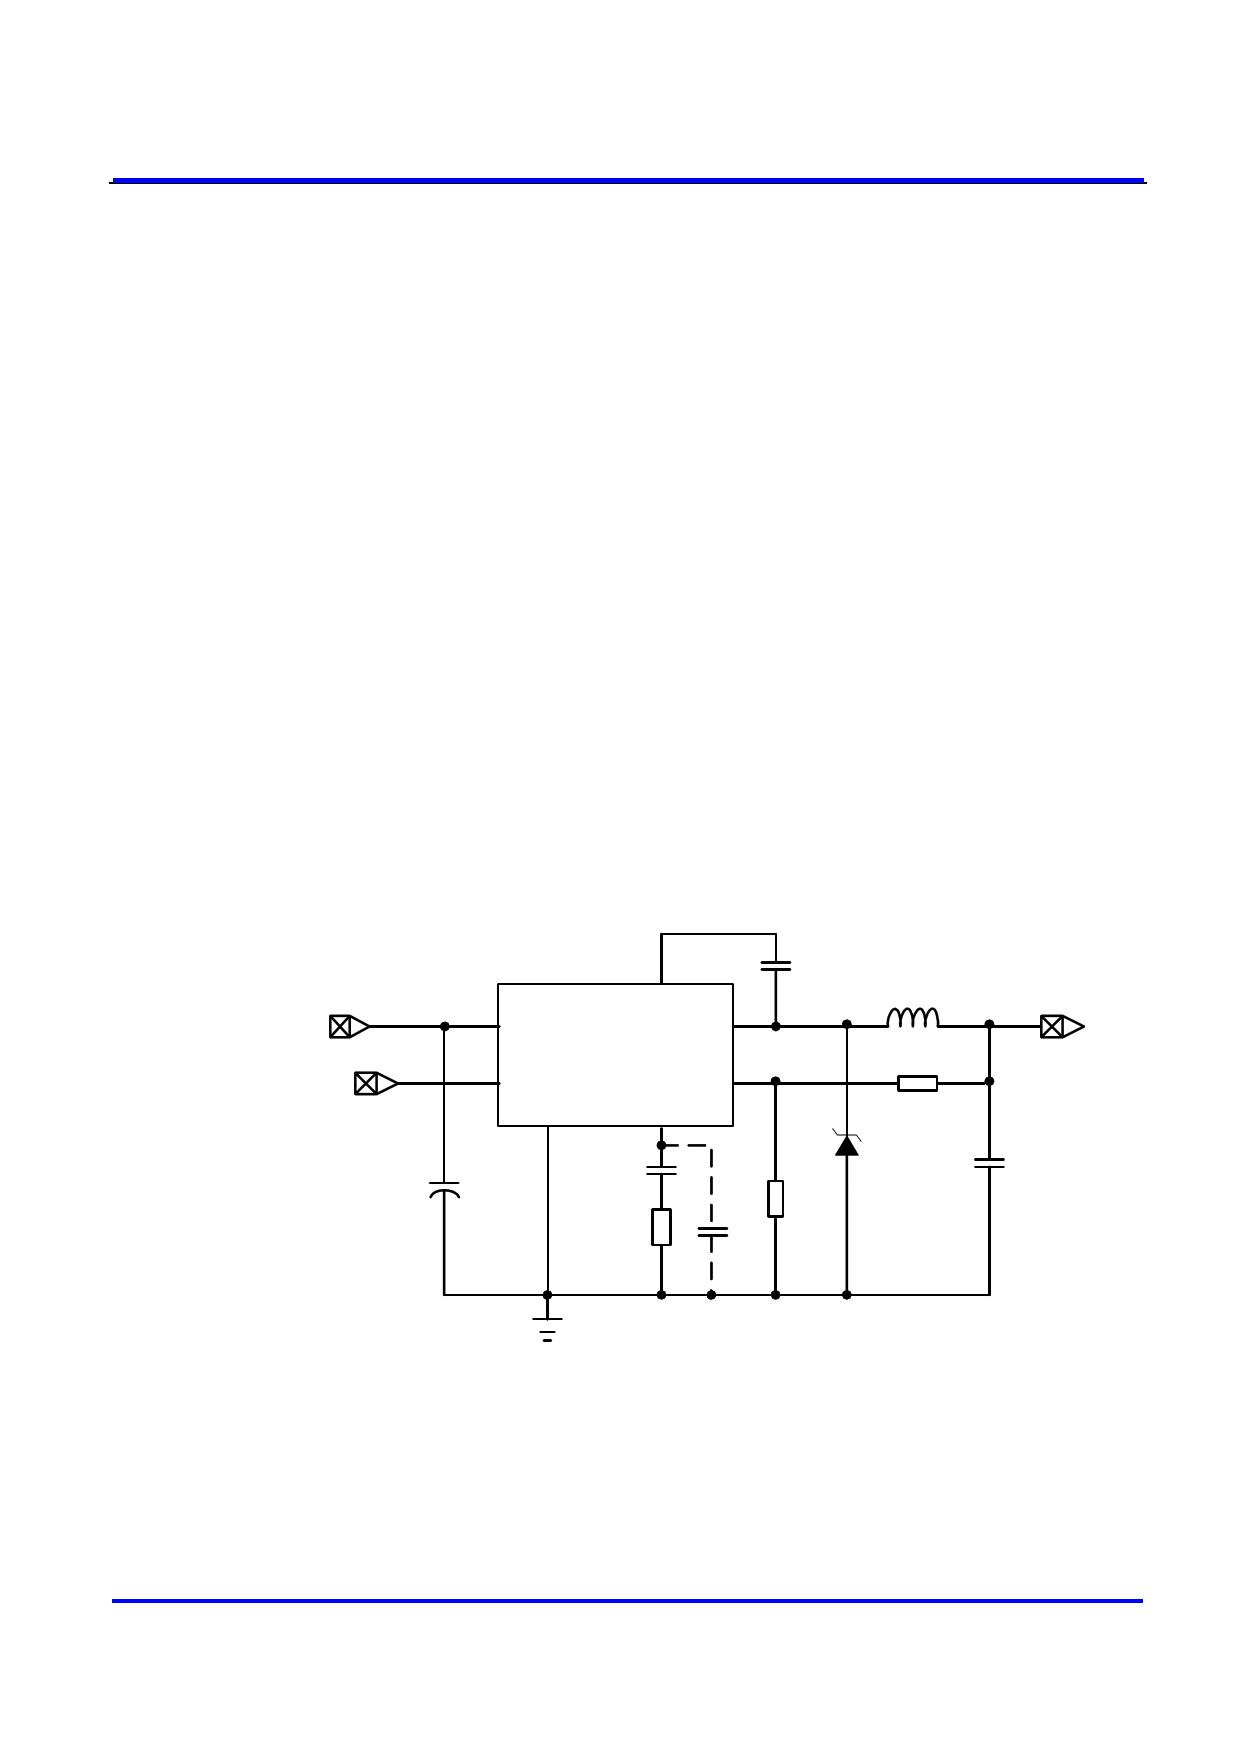 BM1410A datasheet pinout